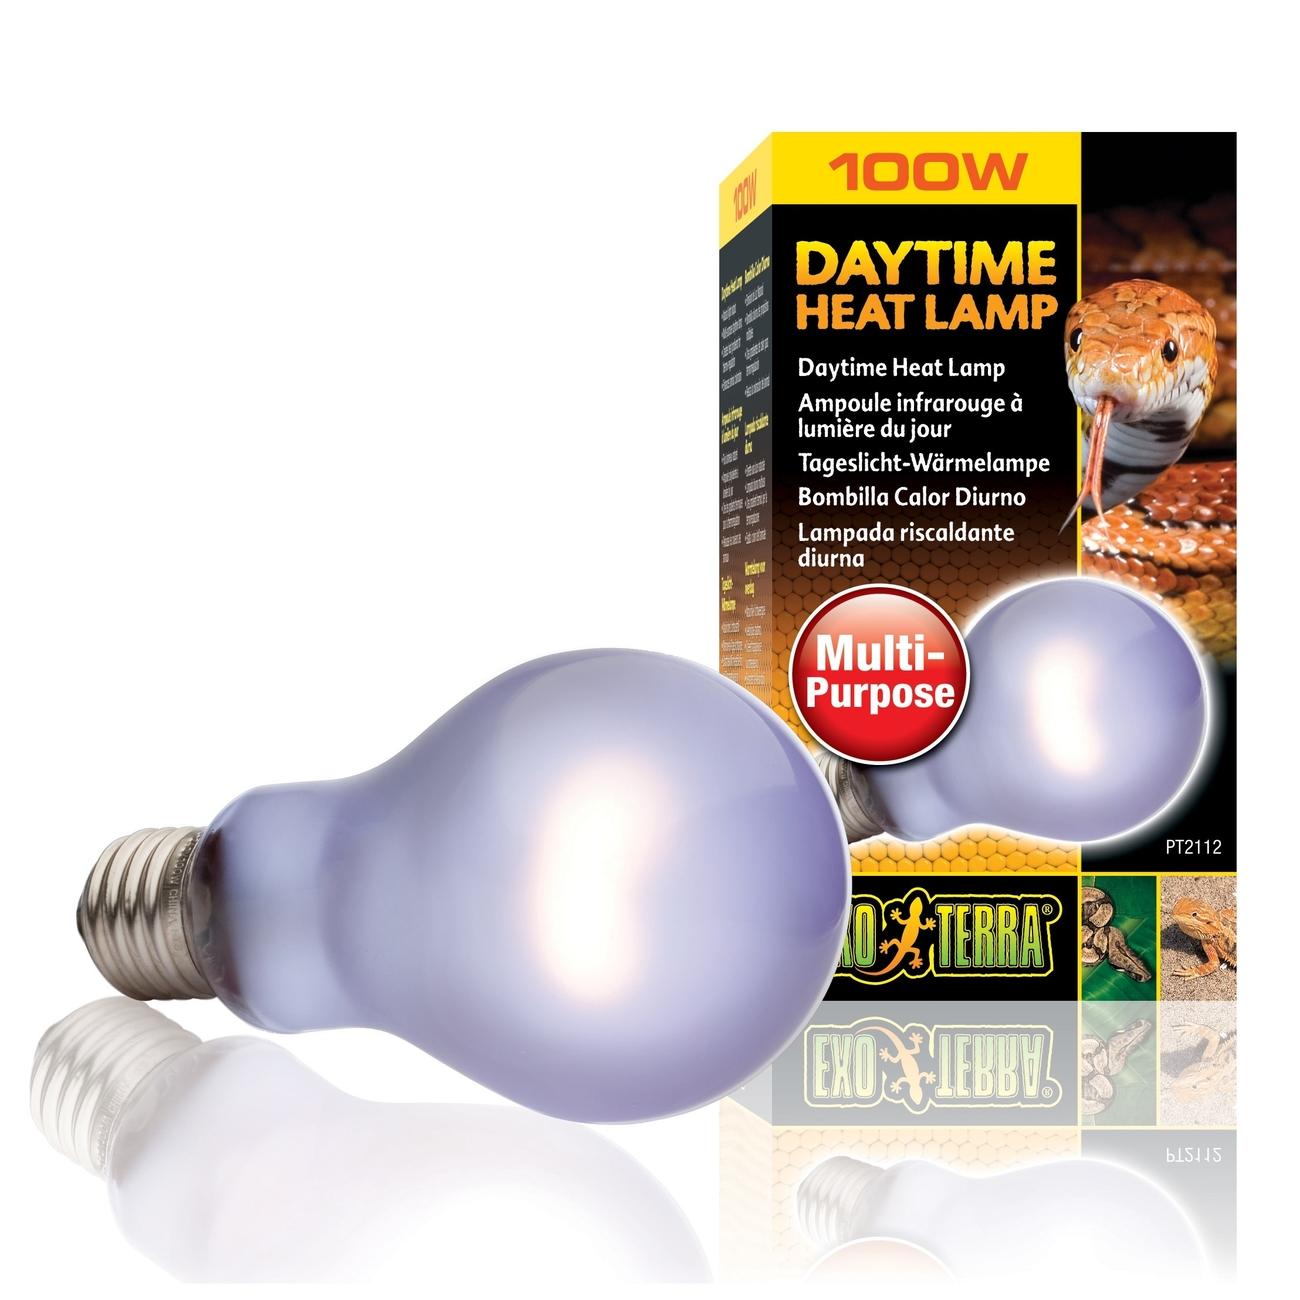 Exo Terra - Daytime Heat Lampe, Bild 9